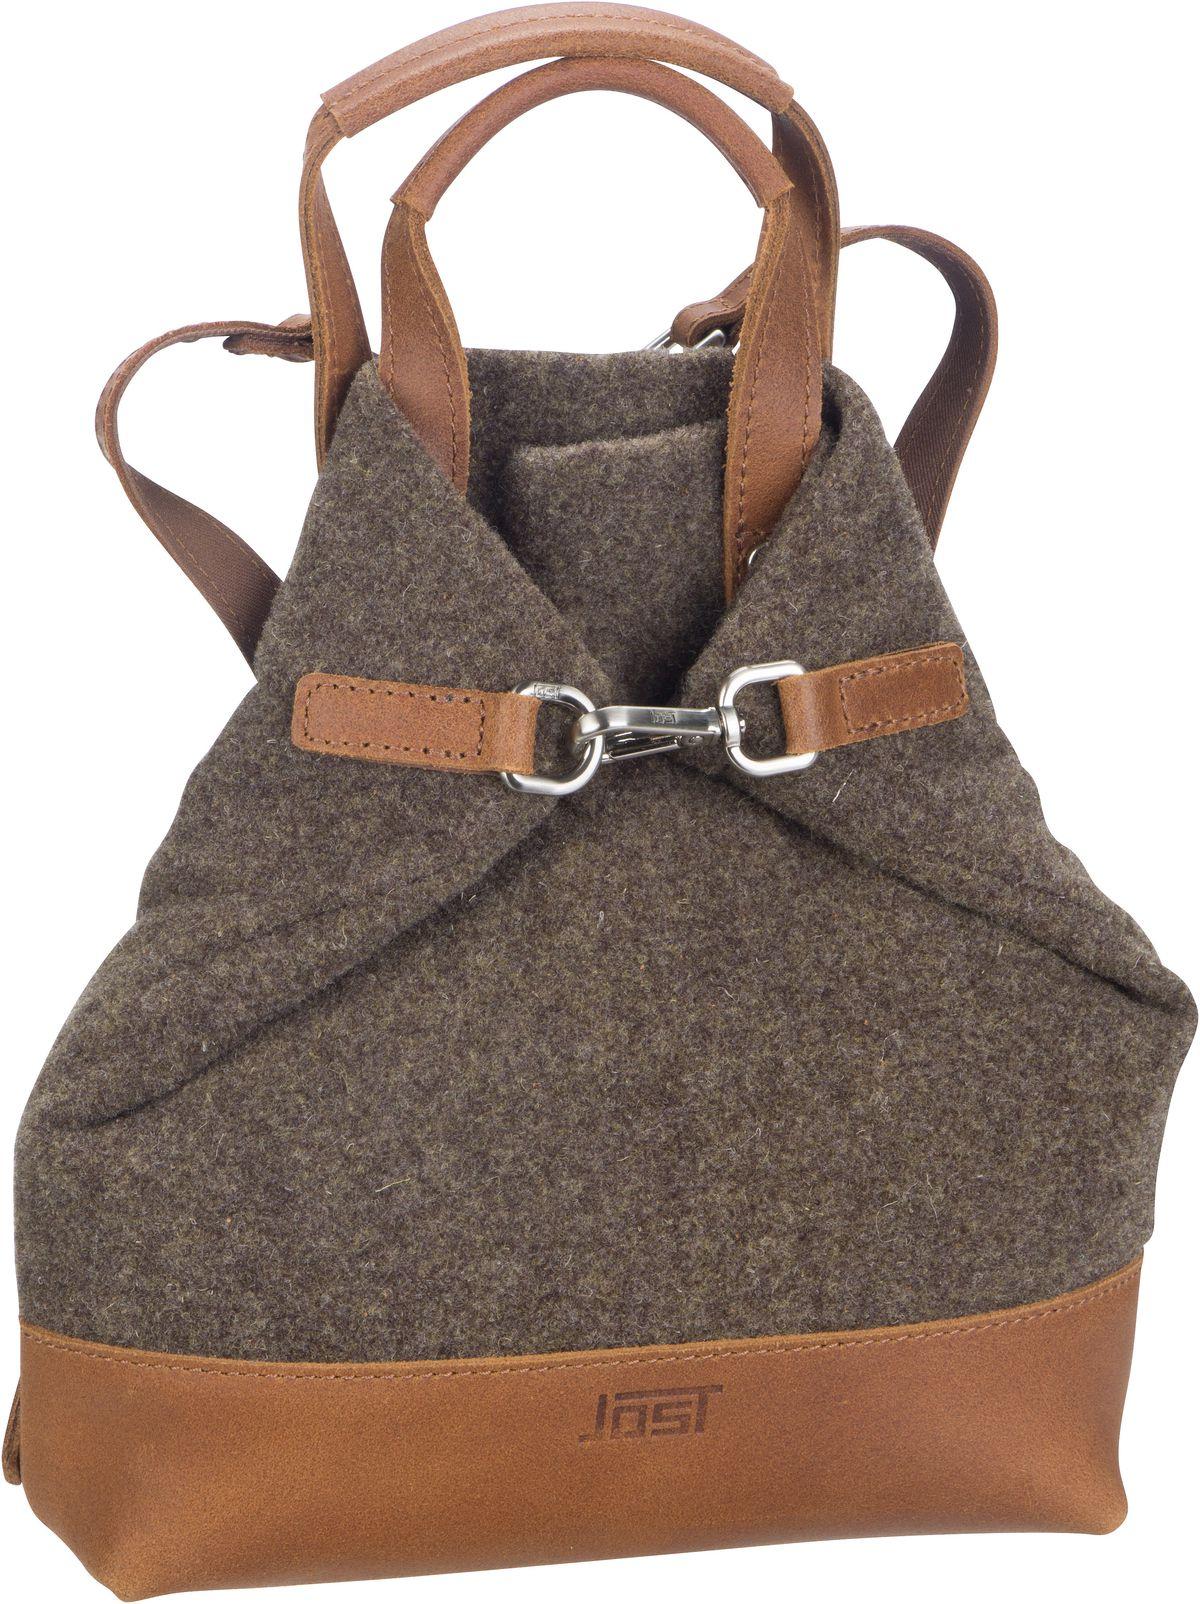 Rucksack / Daypack Farum 3024 X-Change Bag Mini Brown